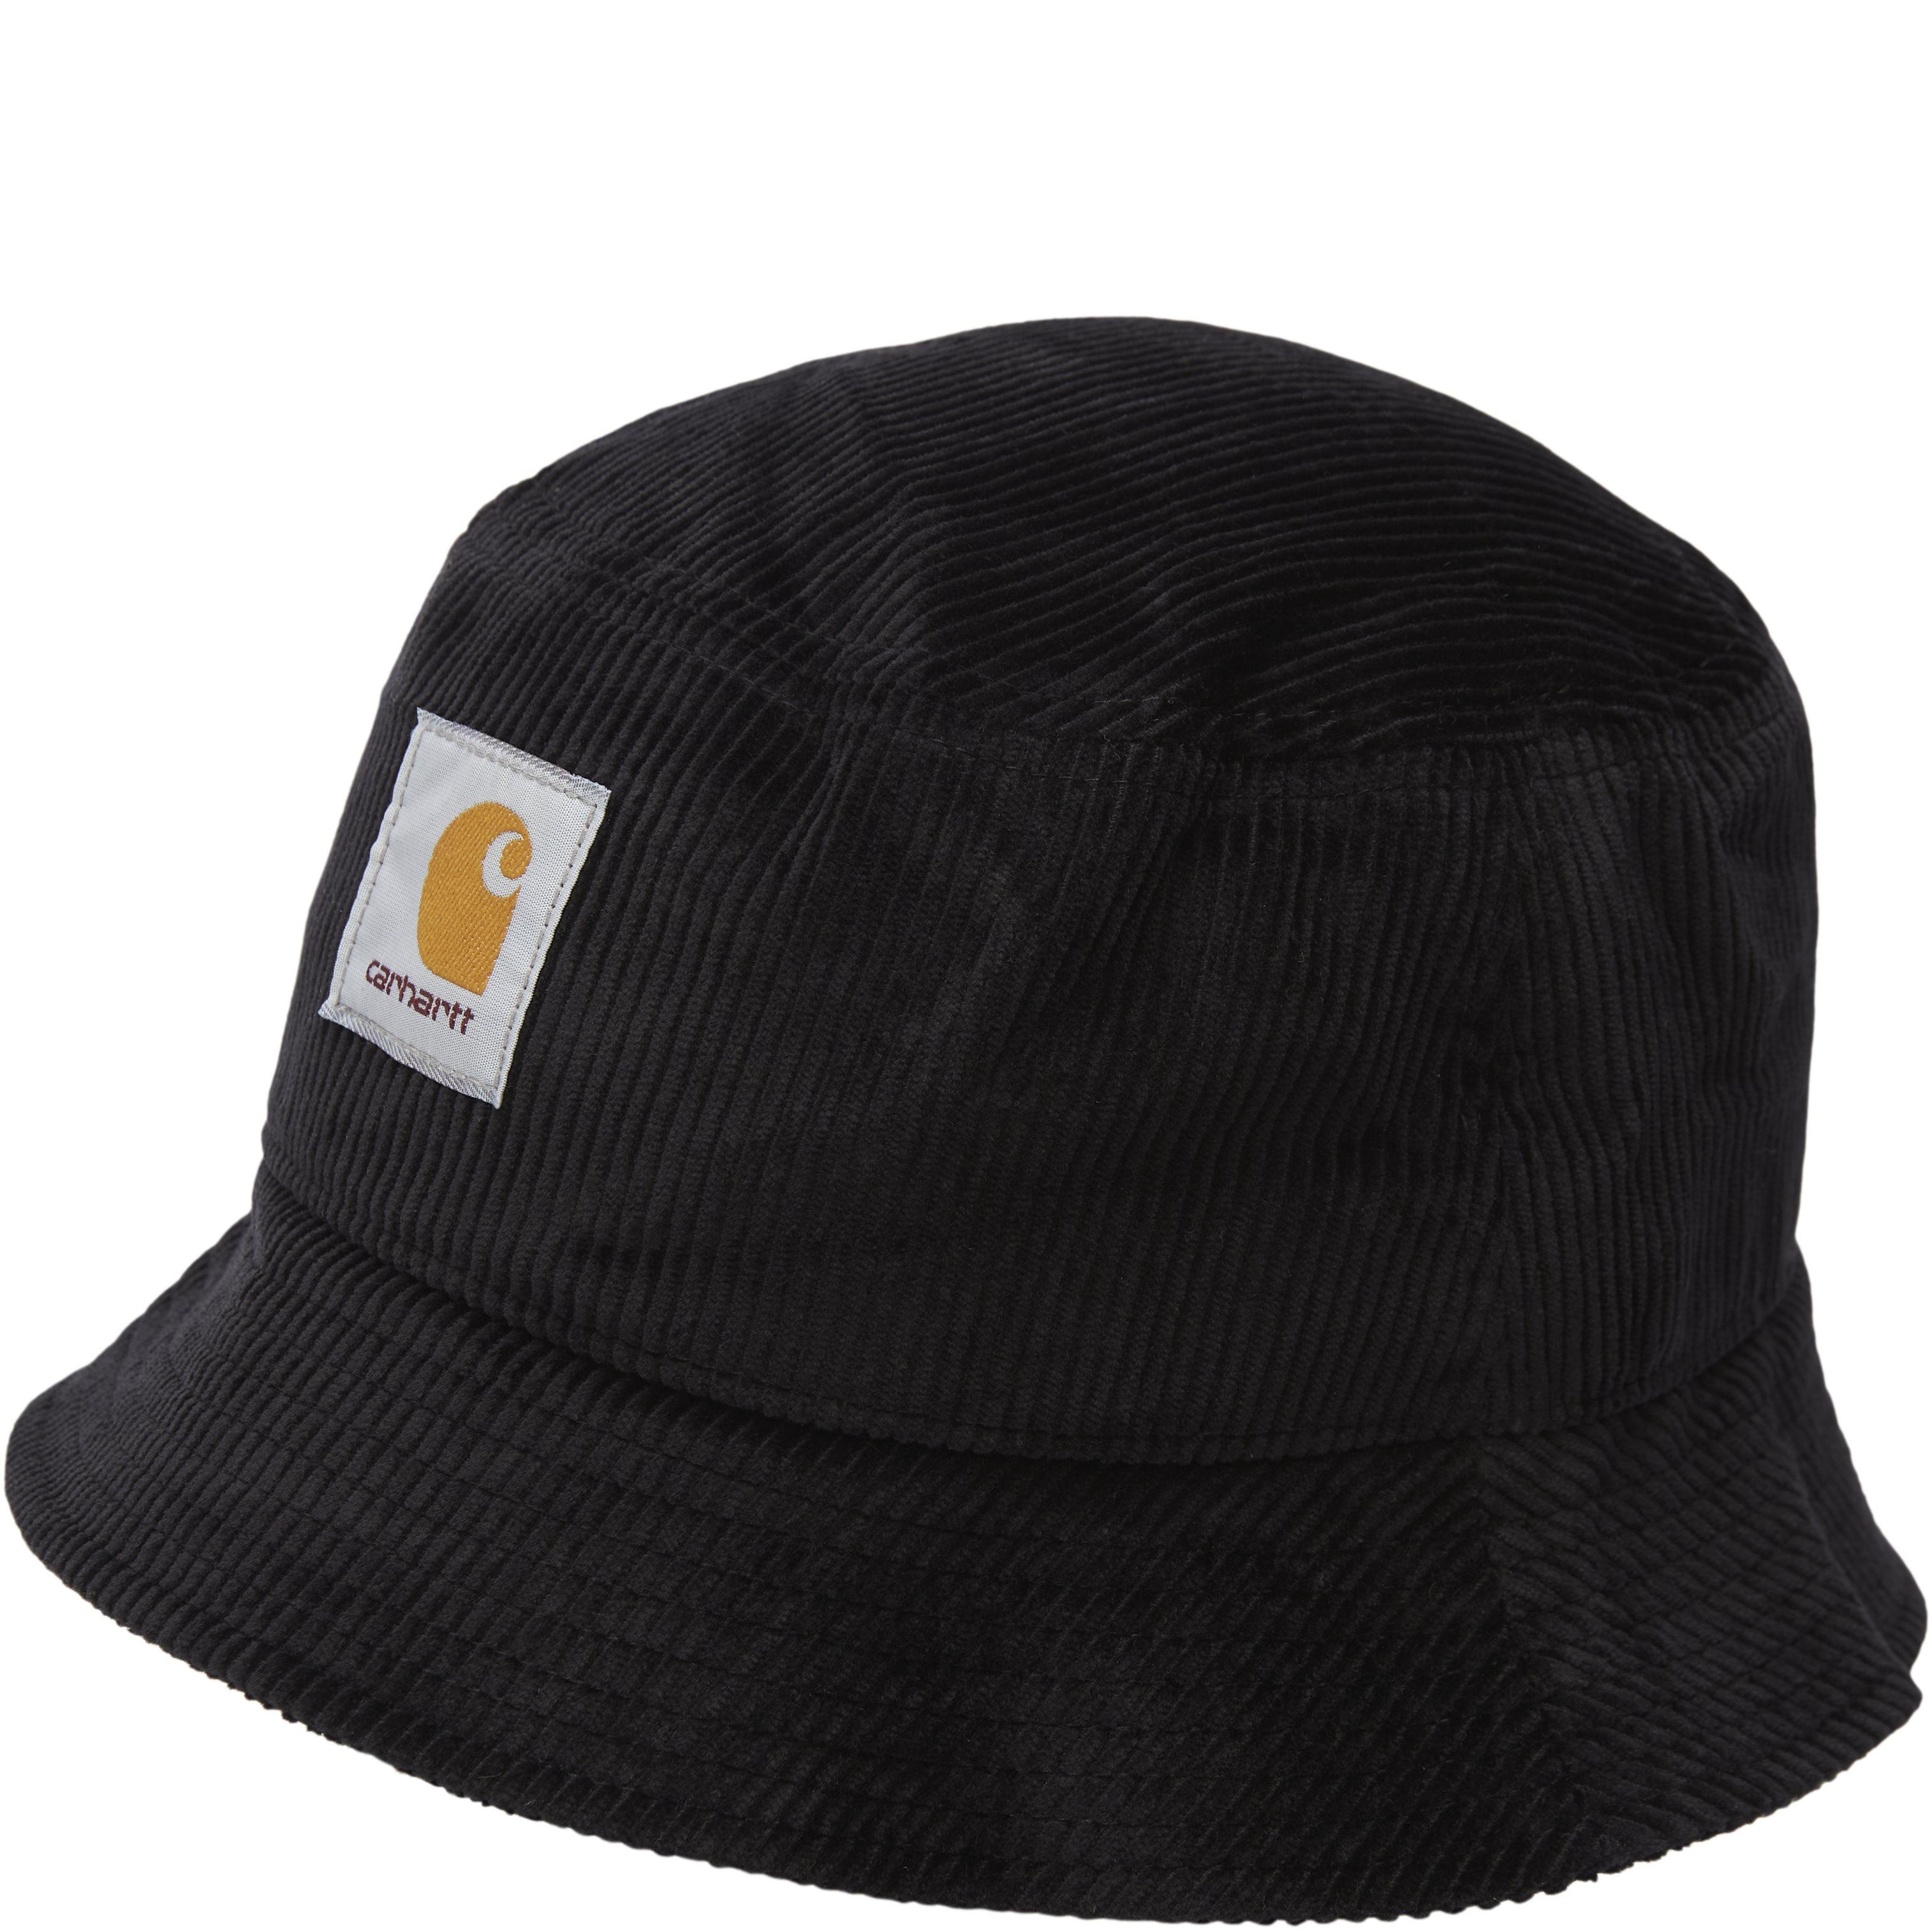 Cord Bucket Hat - Caps - Black